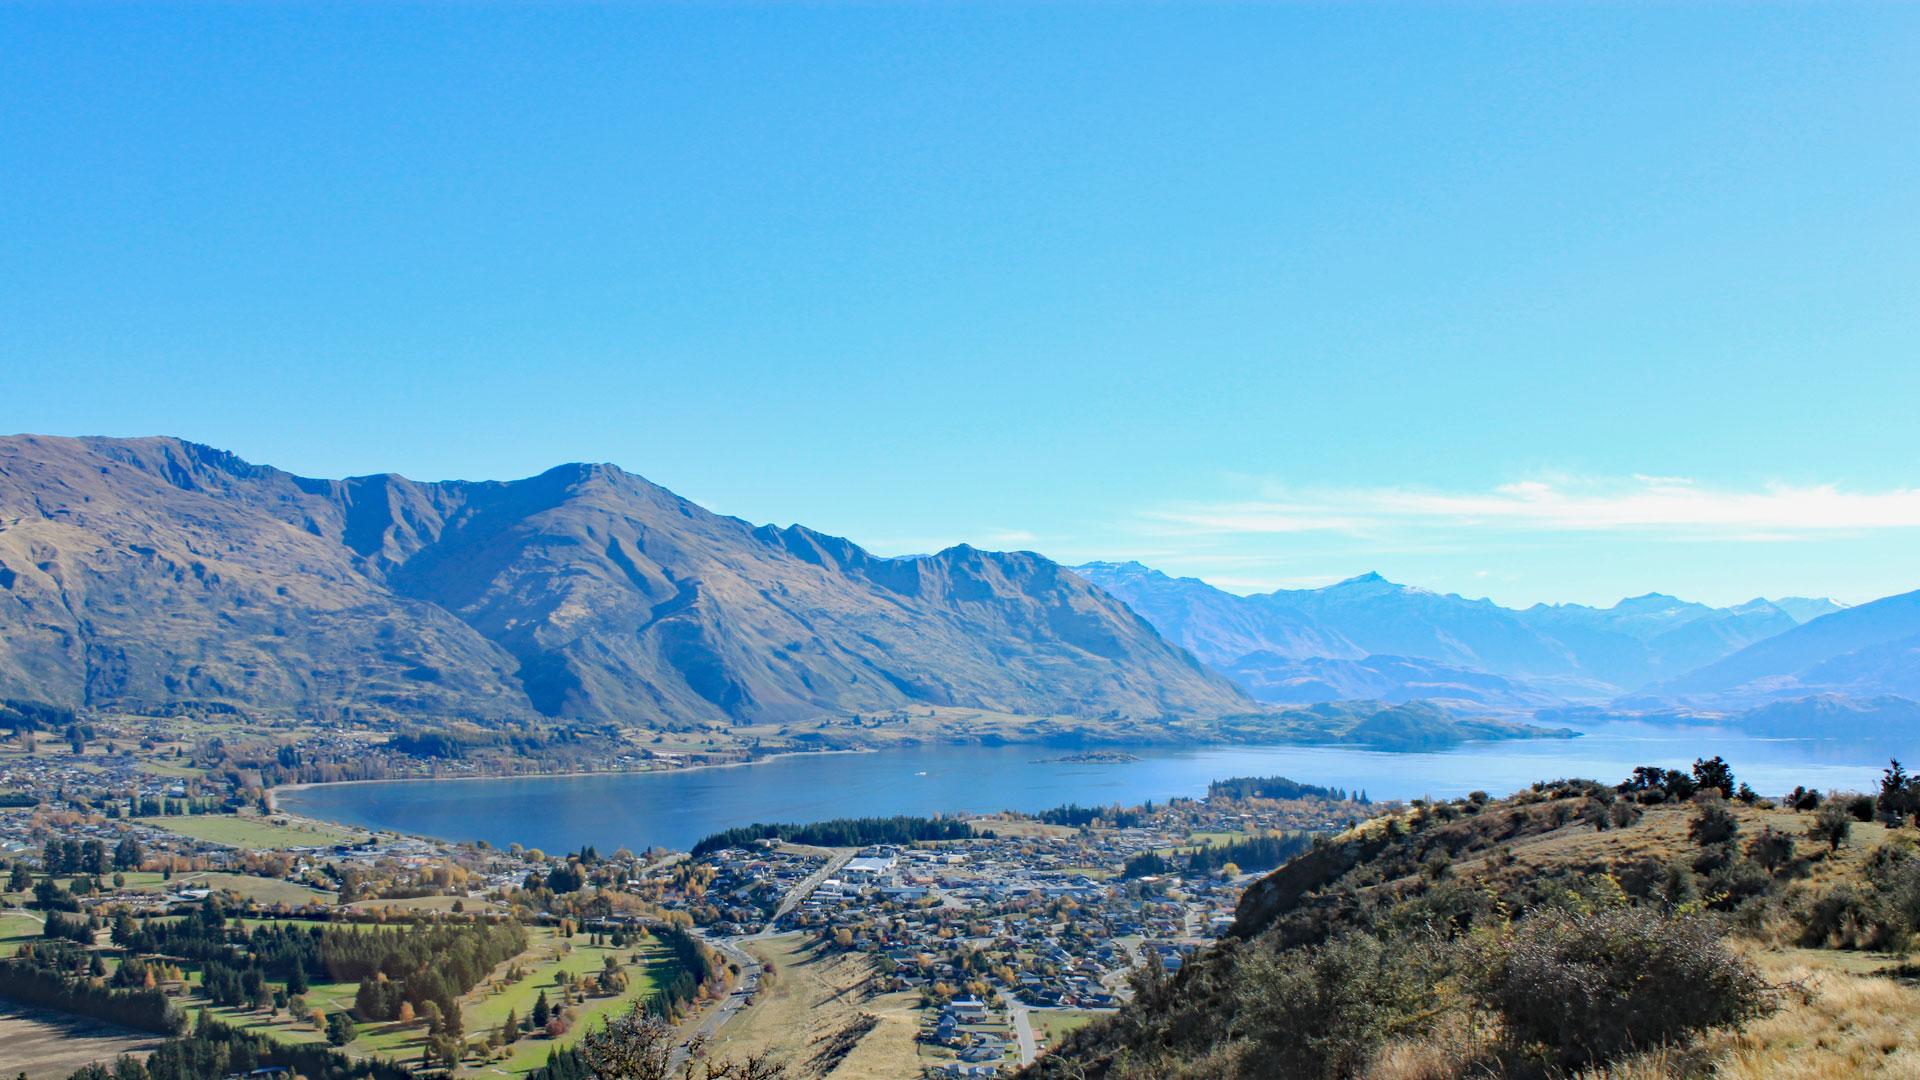 Tanken Tours   ニュージーランド南島クイーンズタウンのガイド会社